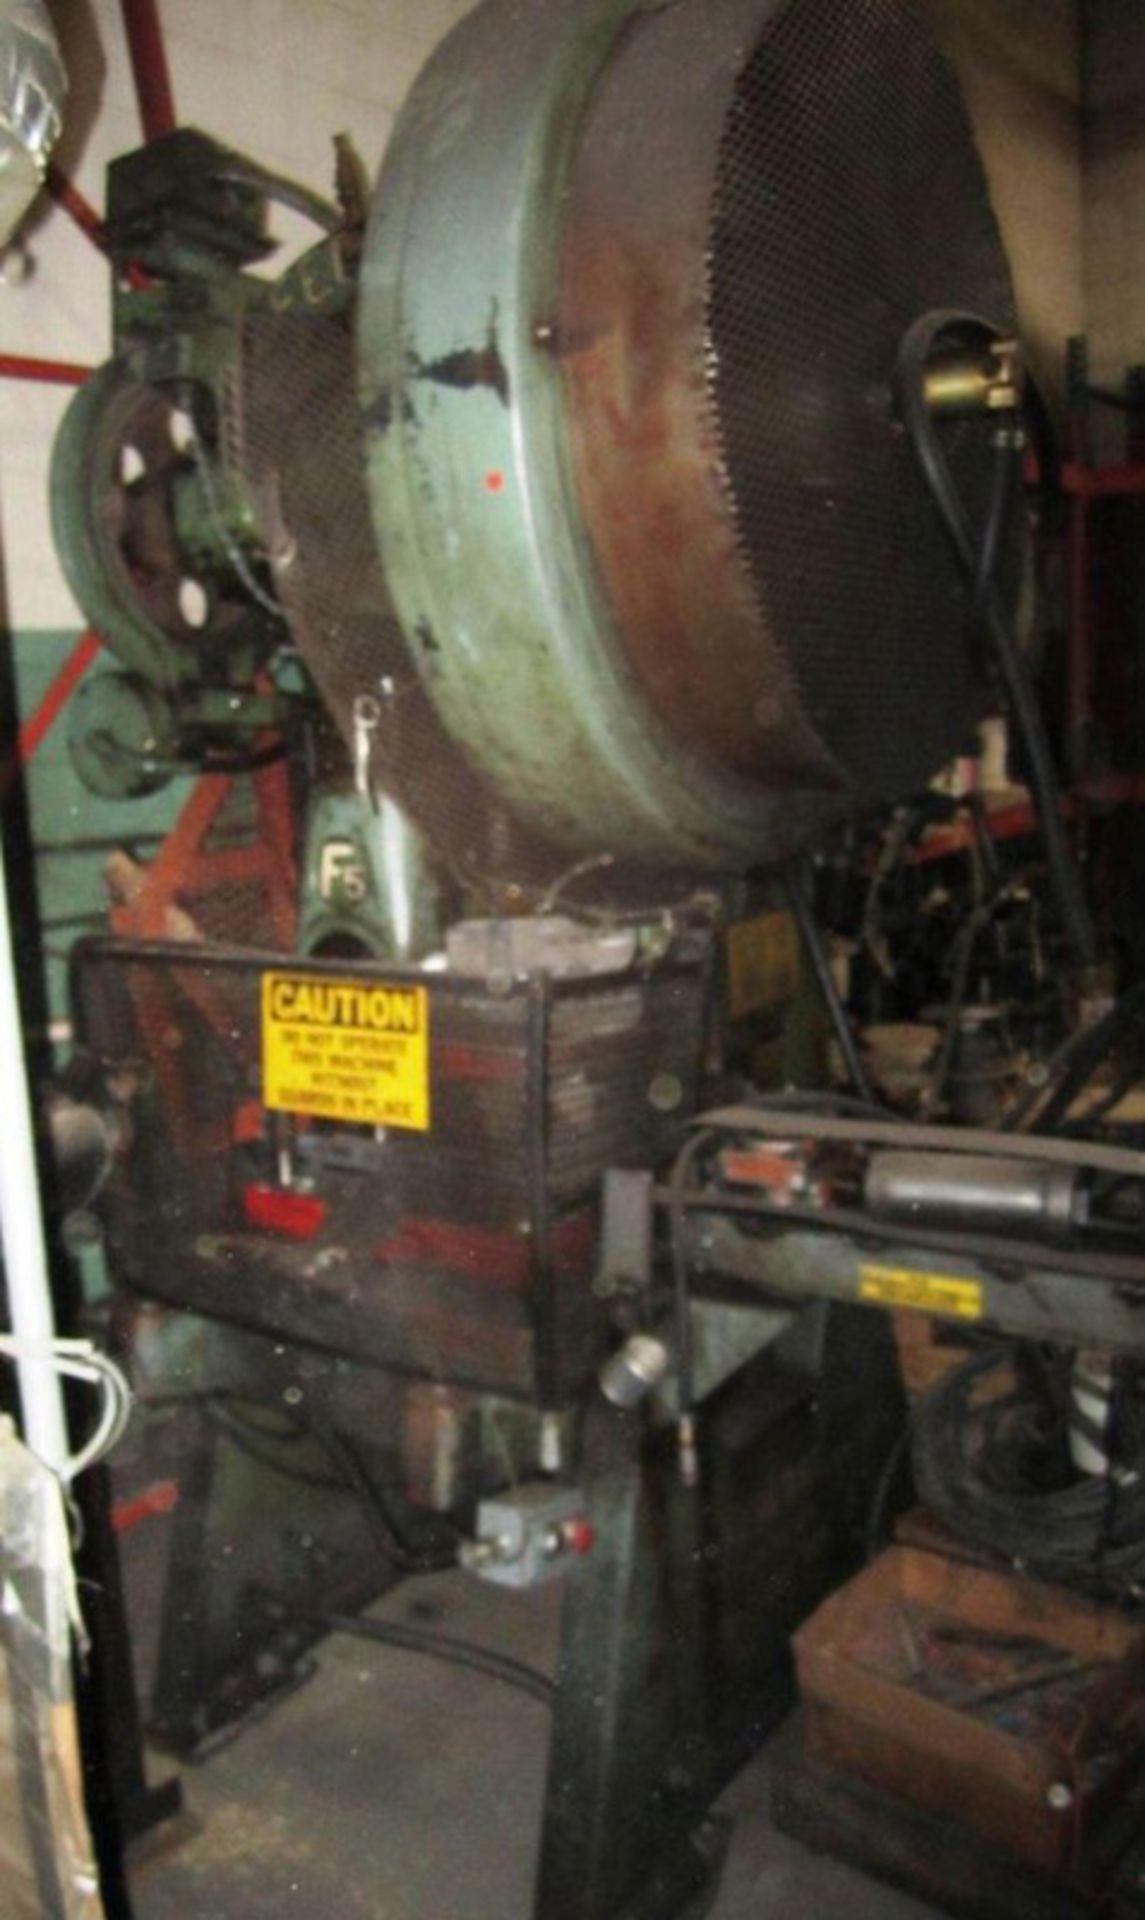 "Federal OBI Punch Press   60-Ton x 29 1/2"" x 18 1/2"", Mdl: F-5, S/N: 125400 - 6397P"